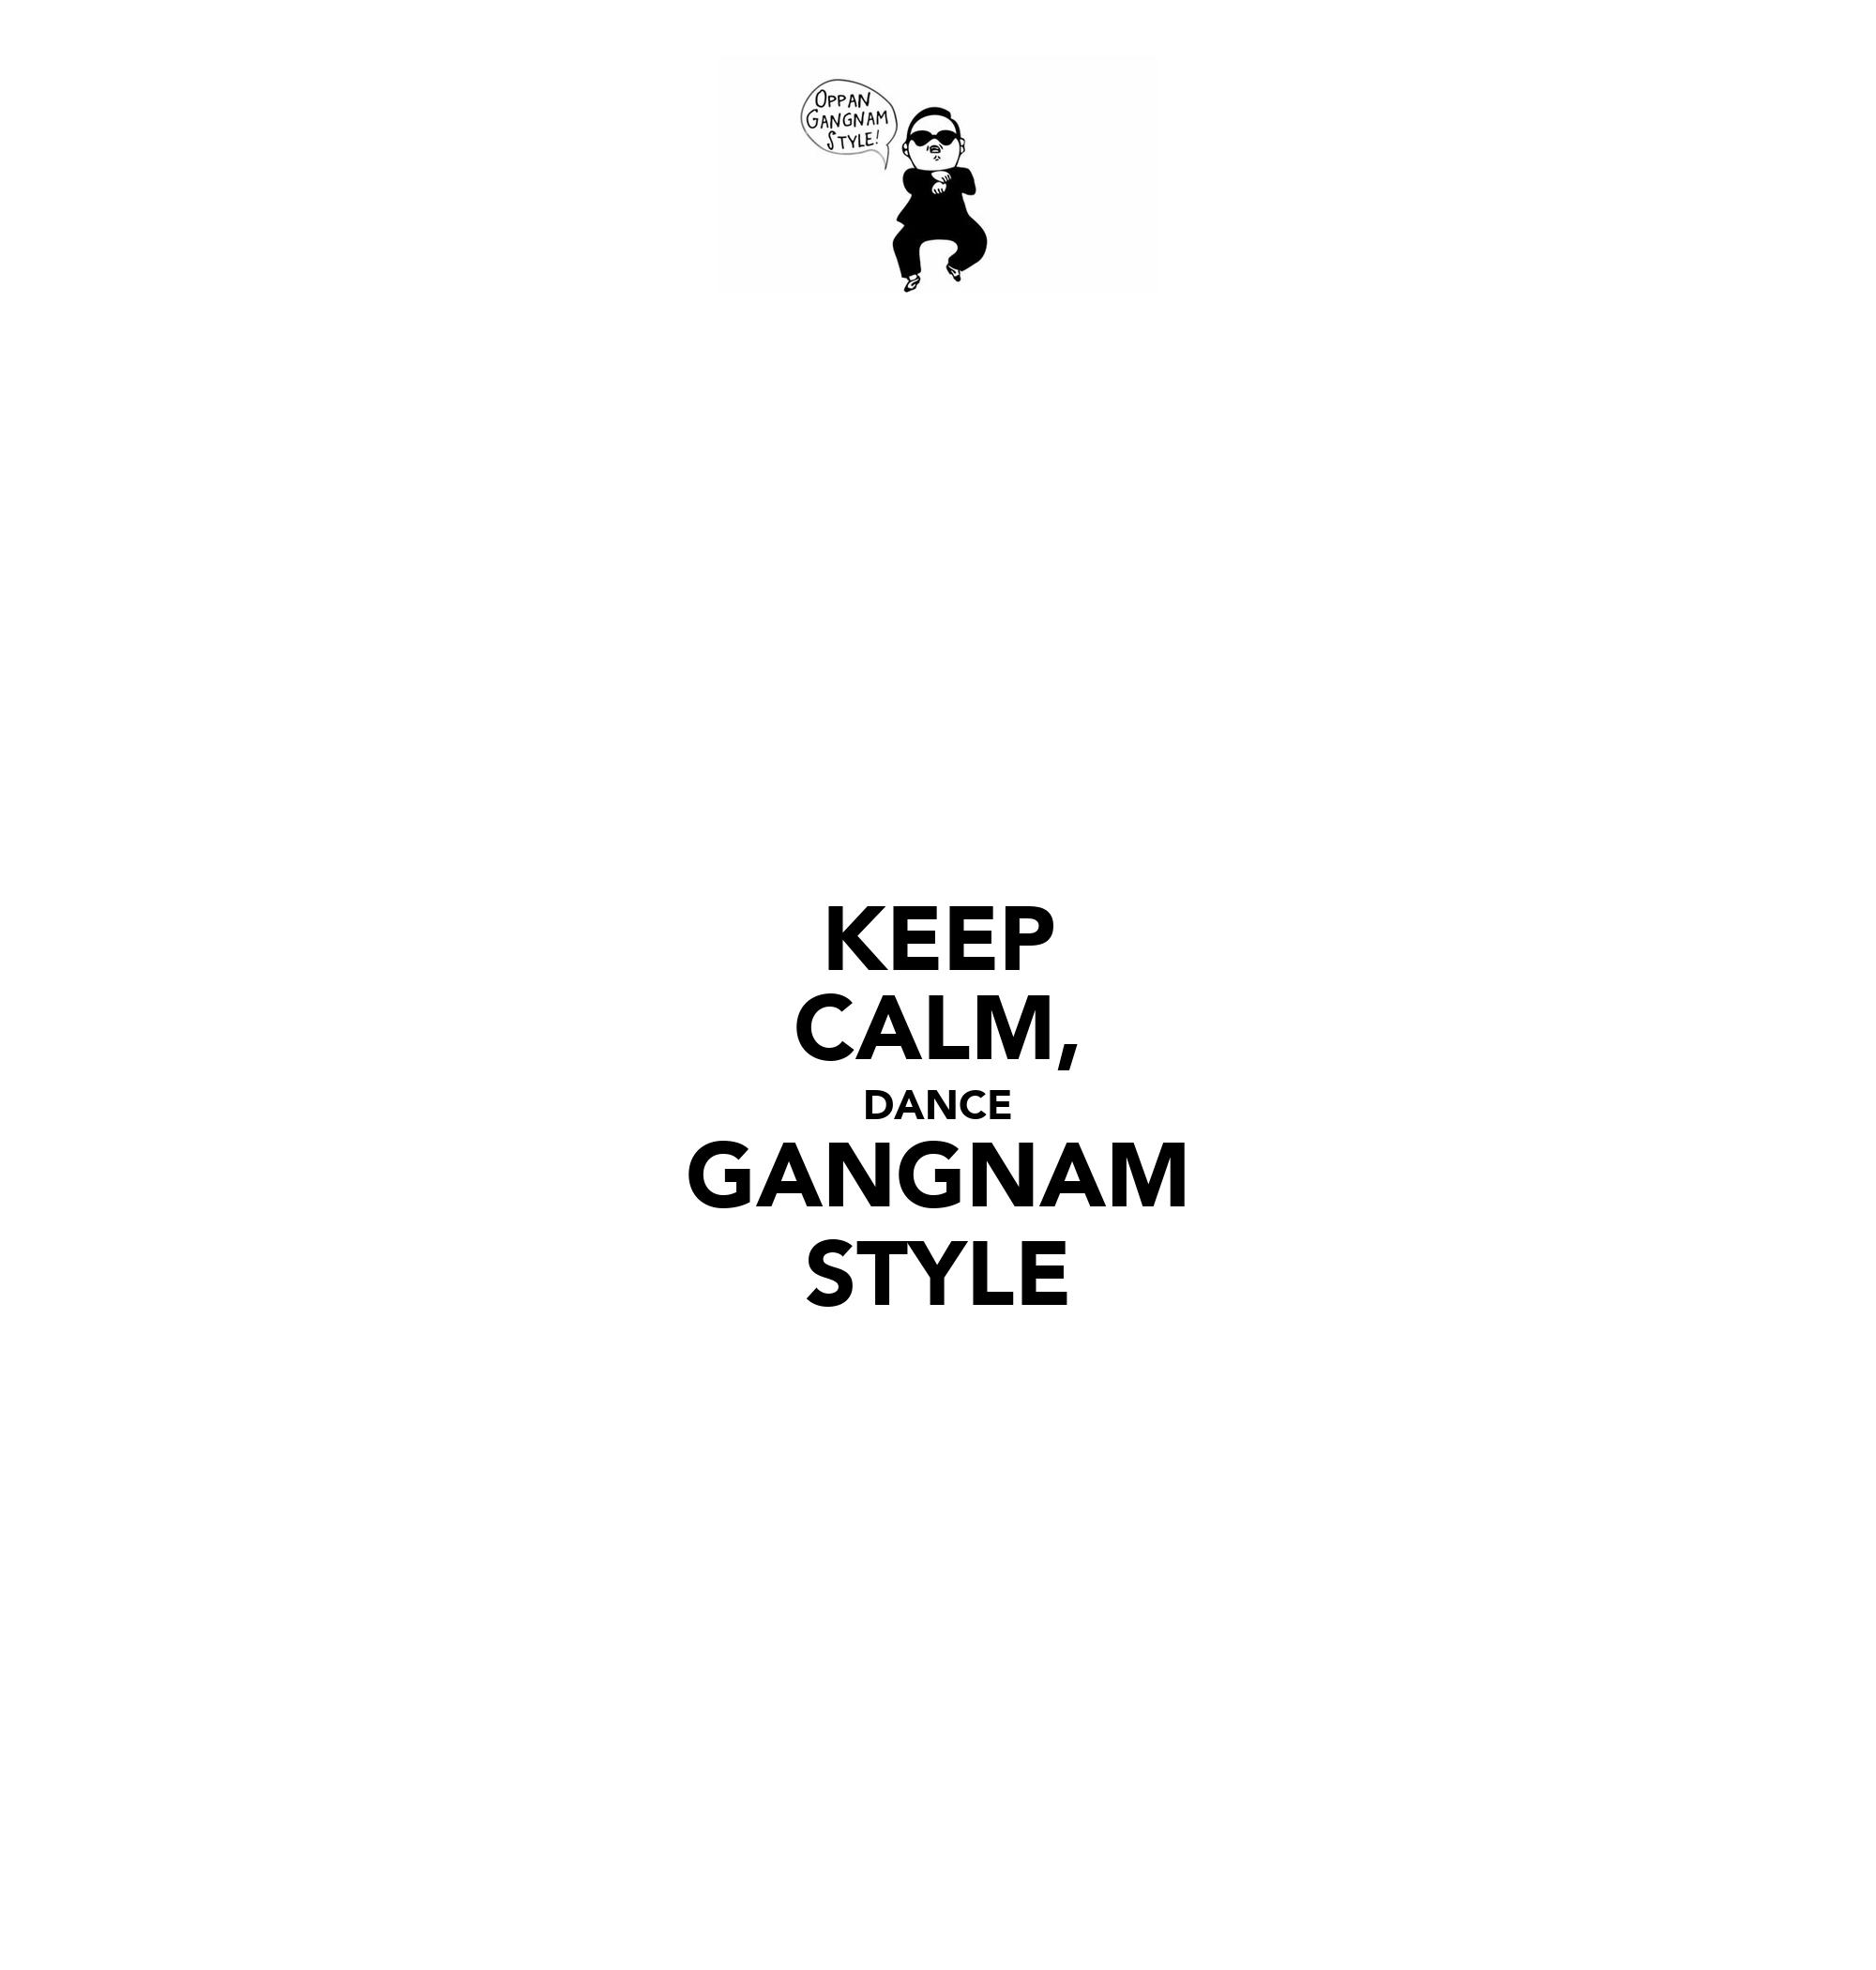 KEEP CALM, DANCE GANGNAM STYLE - KEEP CALM AND CARRY ON Image